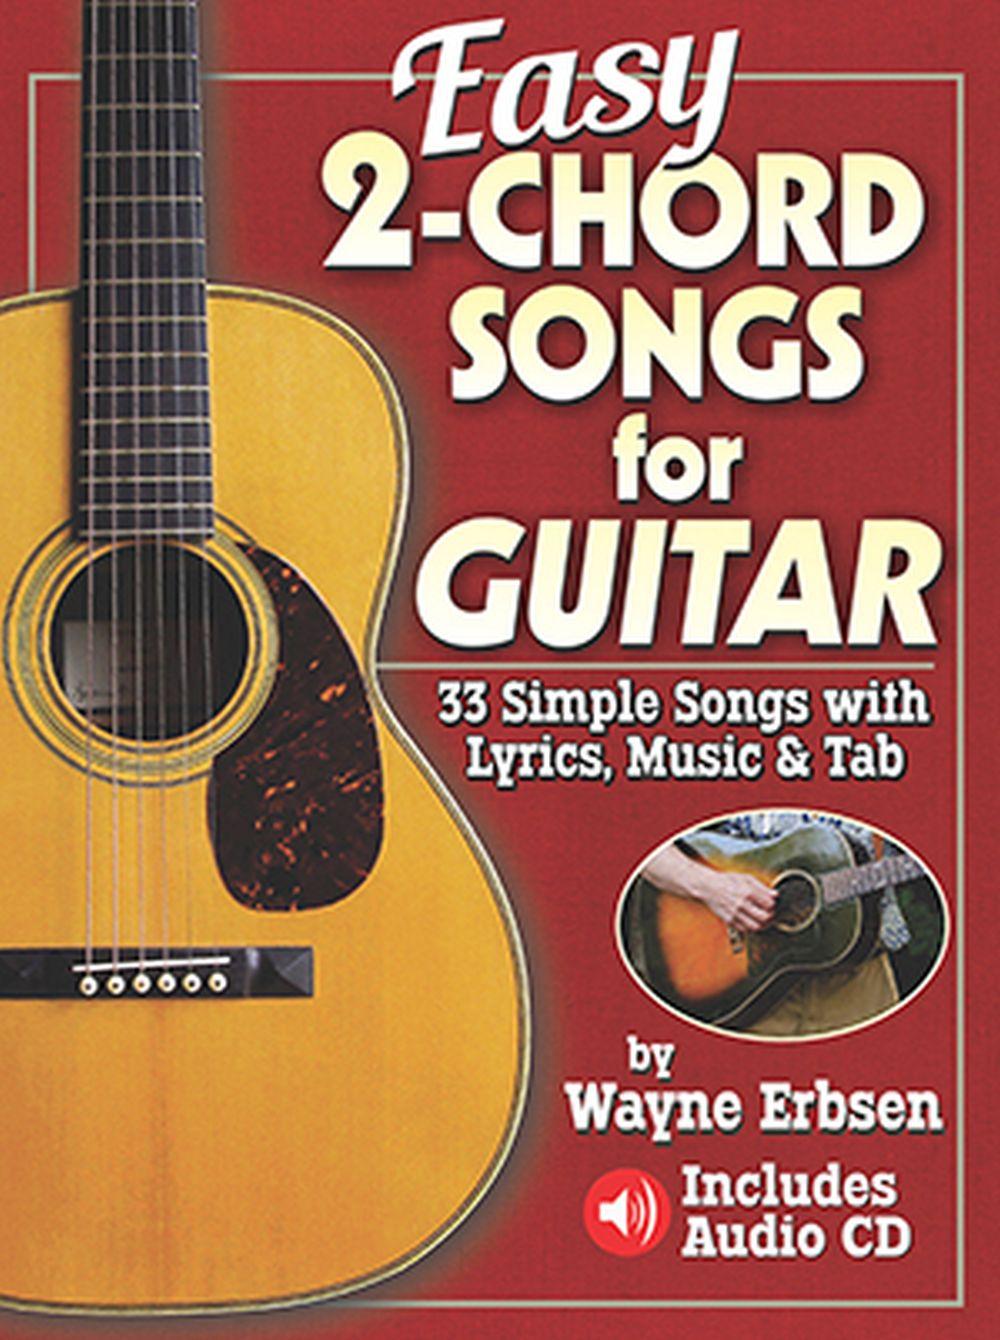 Easy 2-Chord Songs For Guitar